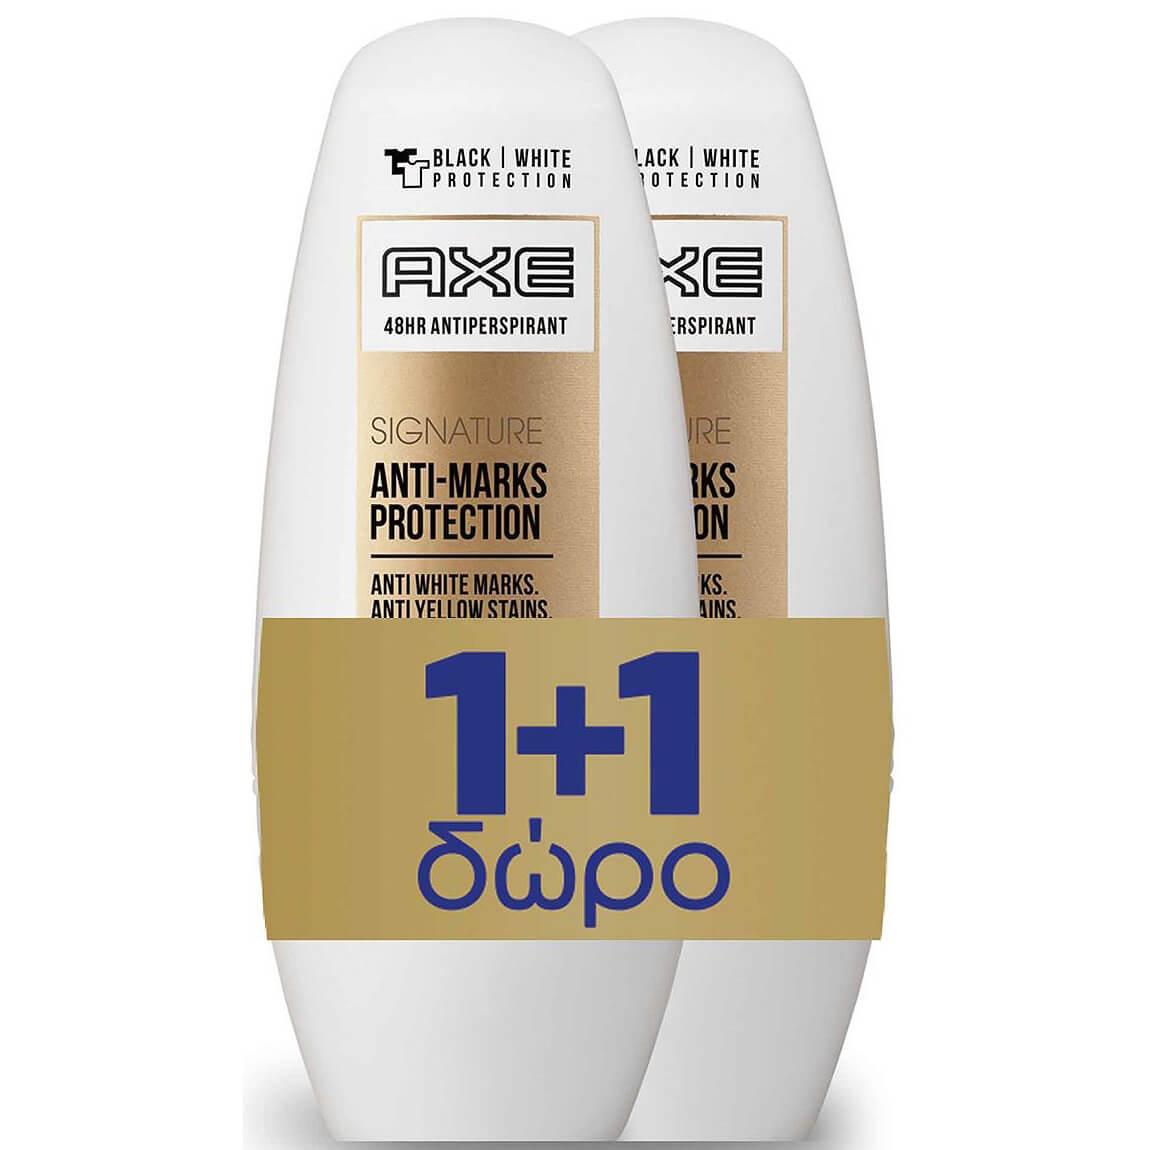 Axe Πακέτο Προσφοράς Signature Anti-Marks Protection Roll on Αποσμητικό 2x50ml 1+1 Δώρο